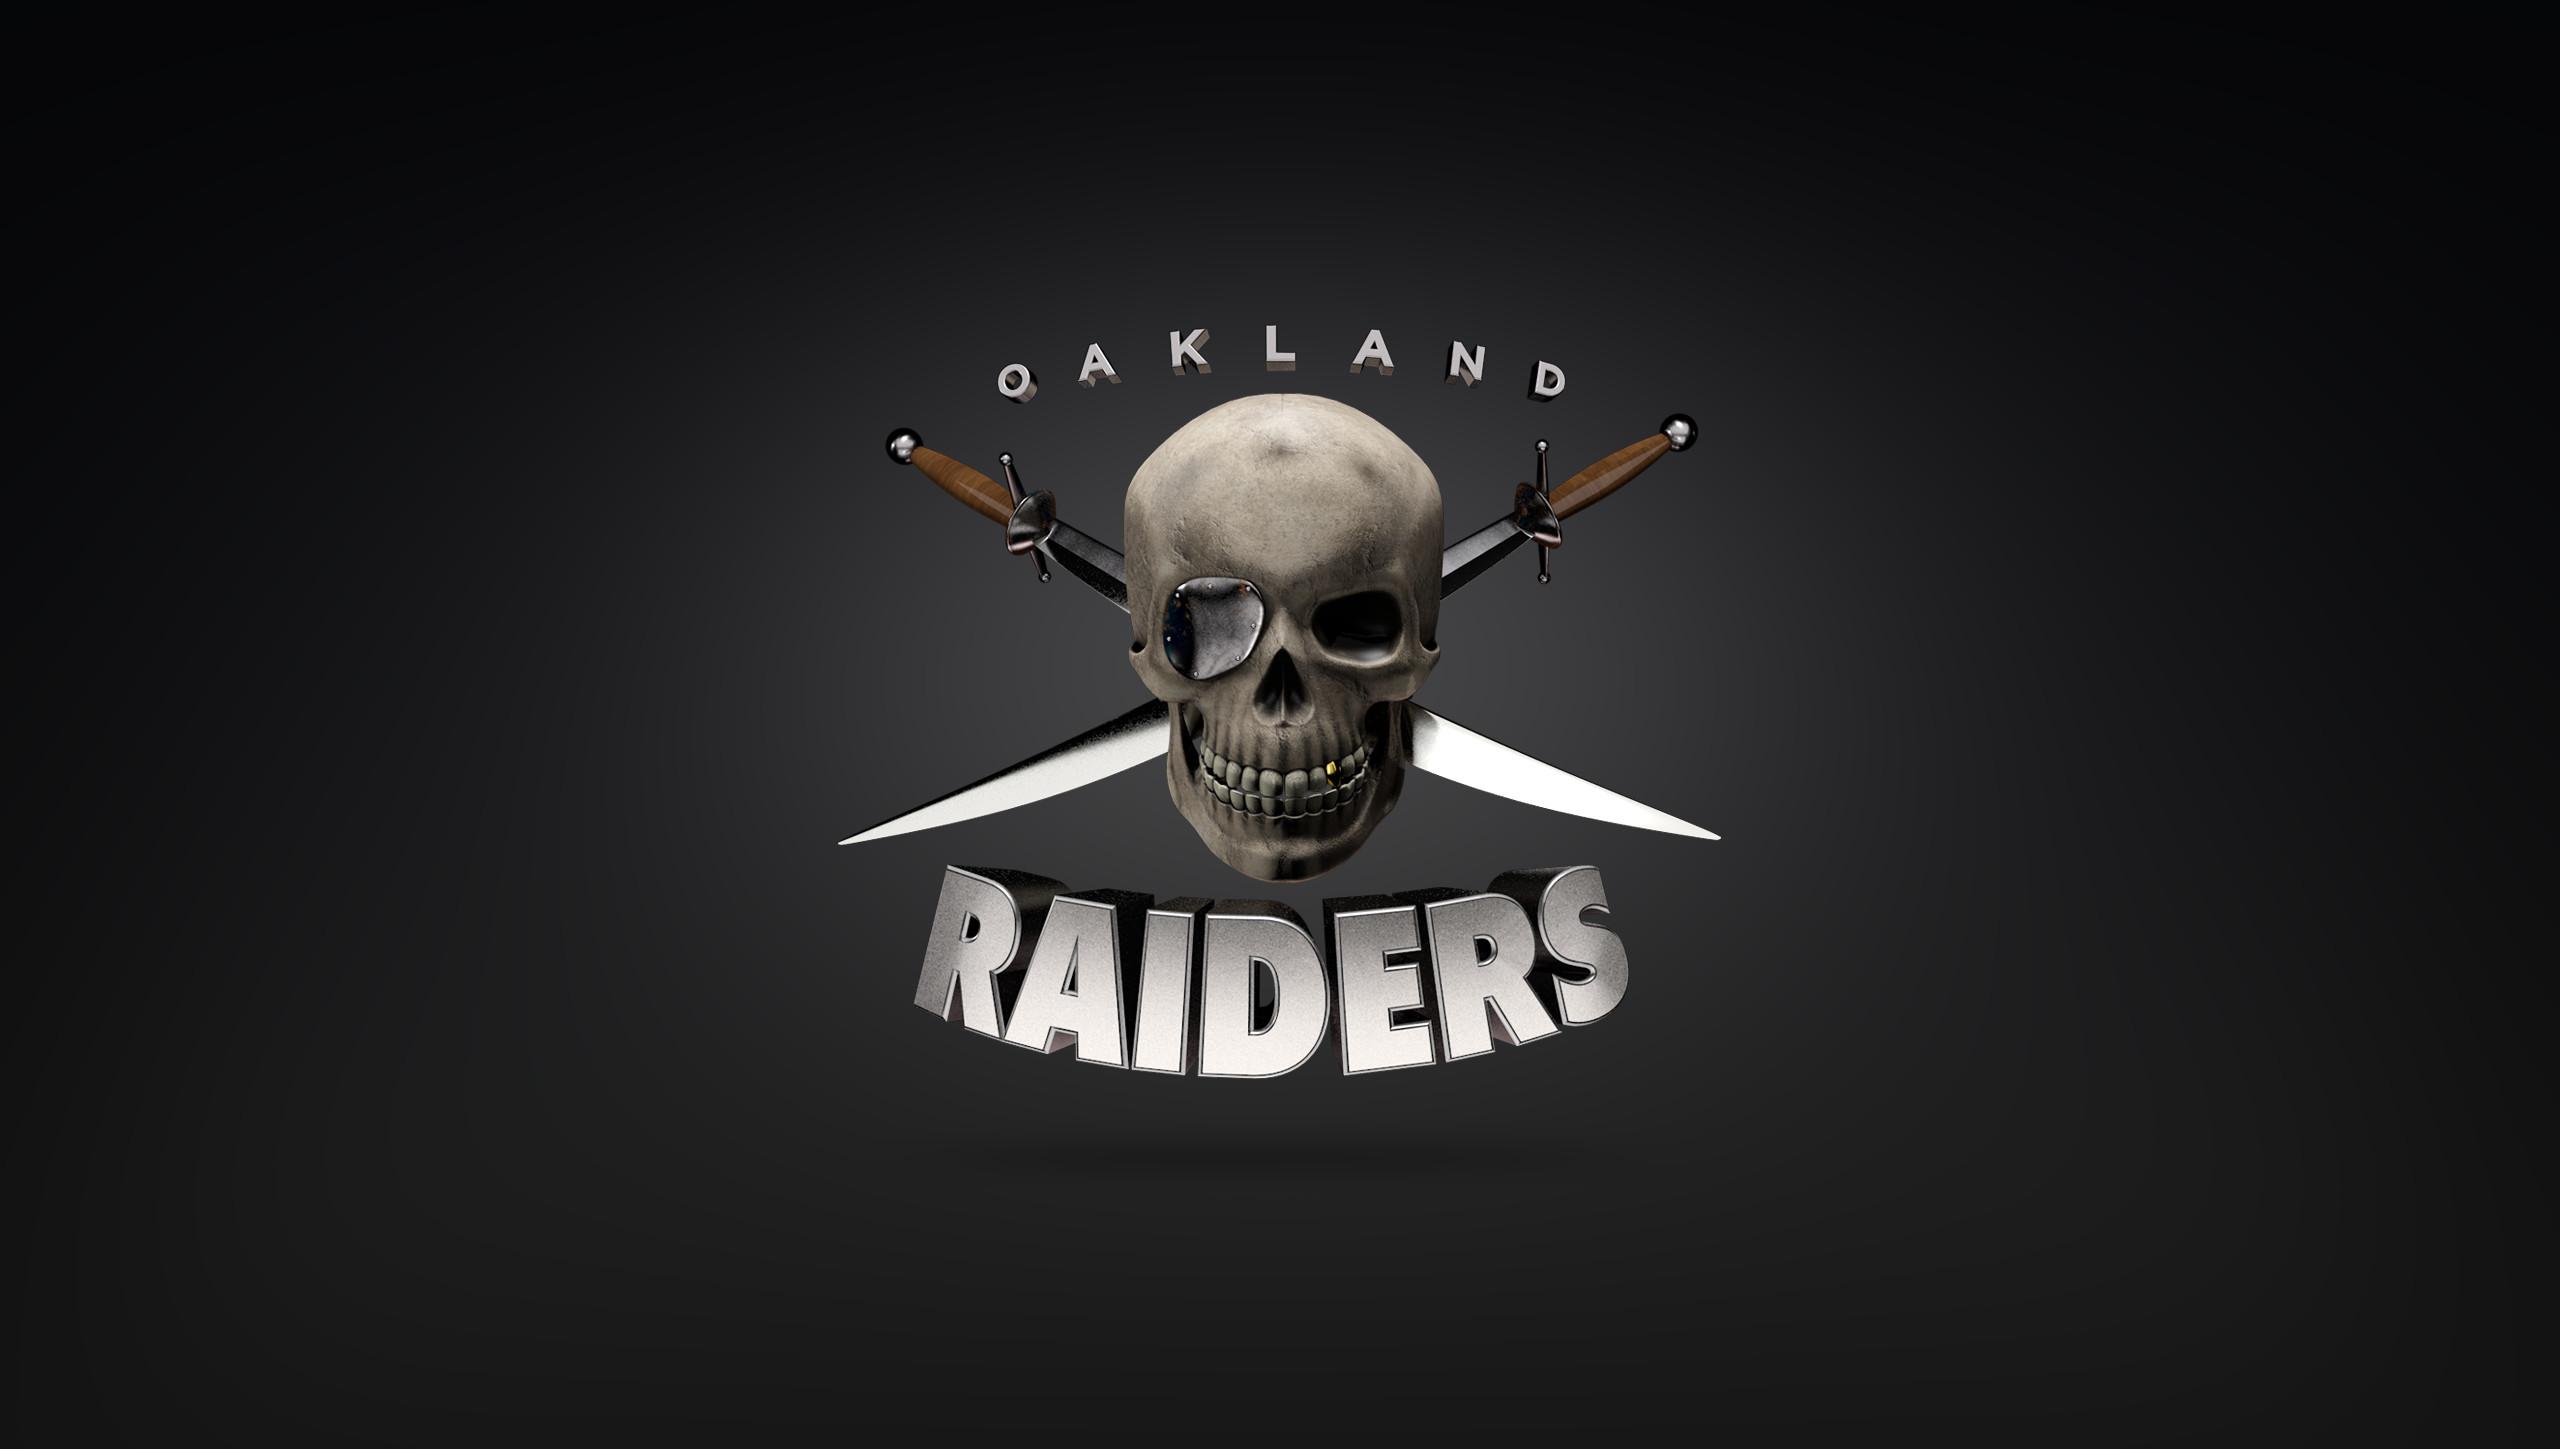 raiders logo wallpapers hd – photo #7. JuJa Italia · raiders logo wallpapers  …